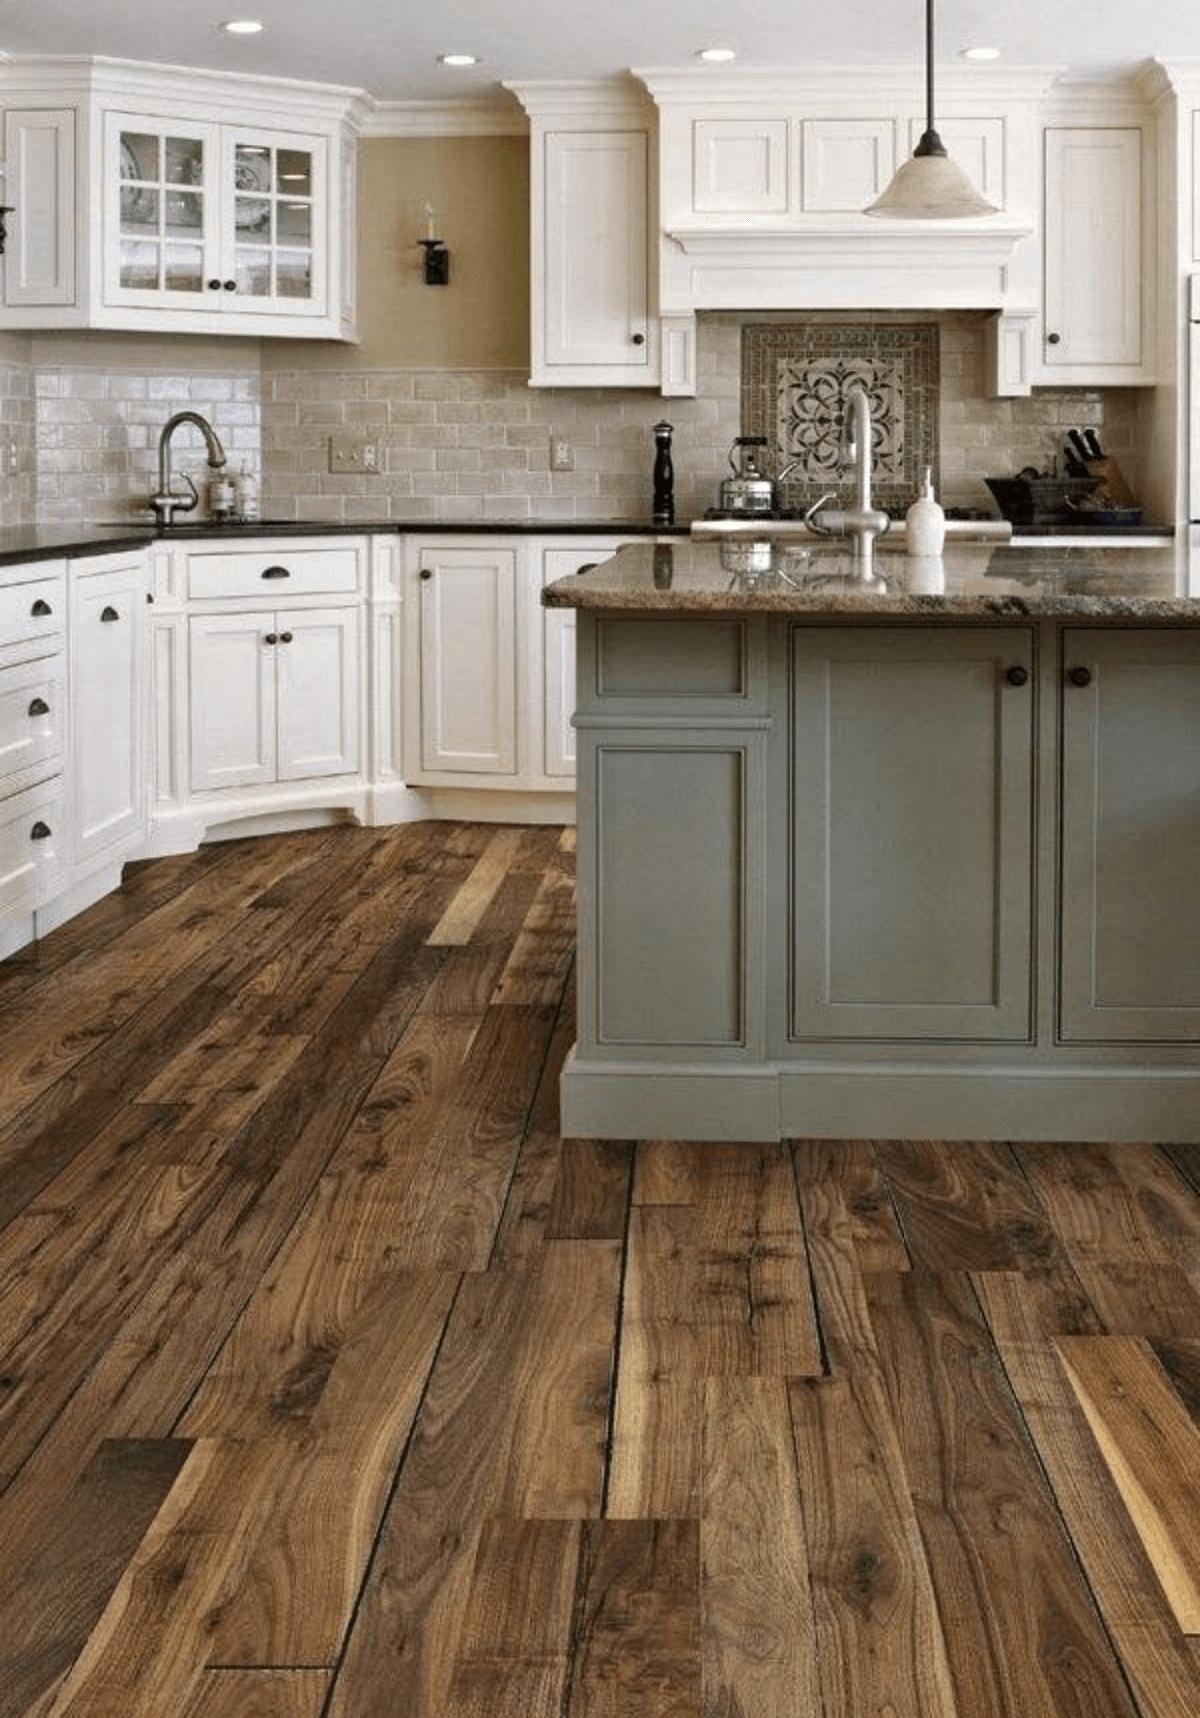 Pacific Northwest Wood Laid Kitchen